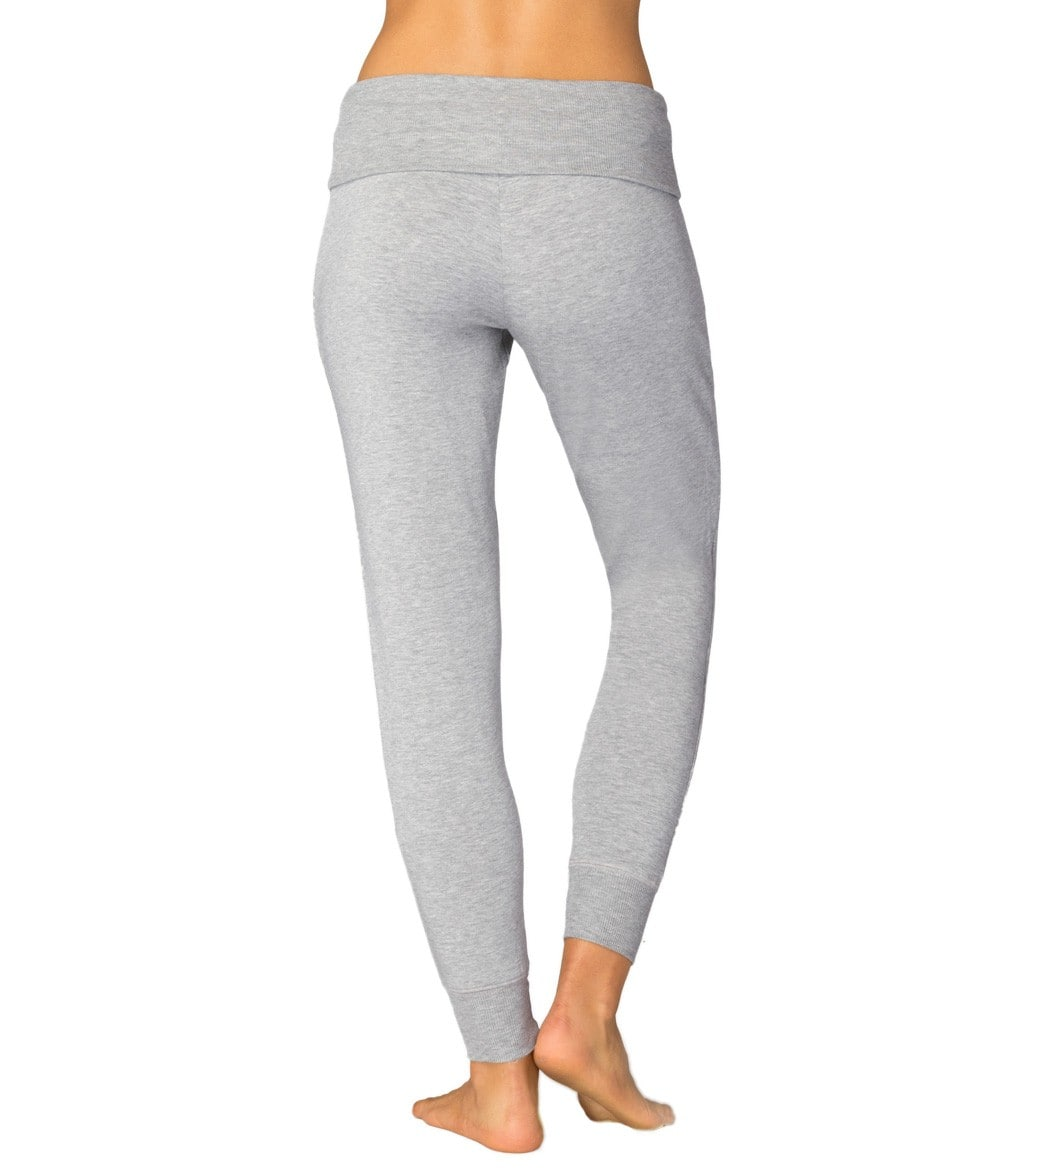 d599e6fd61c7c Beyond Yoga Cozy Fleece Foldover Long Sweatpant Joggers at ...